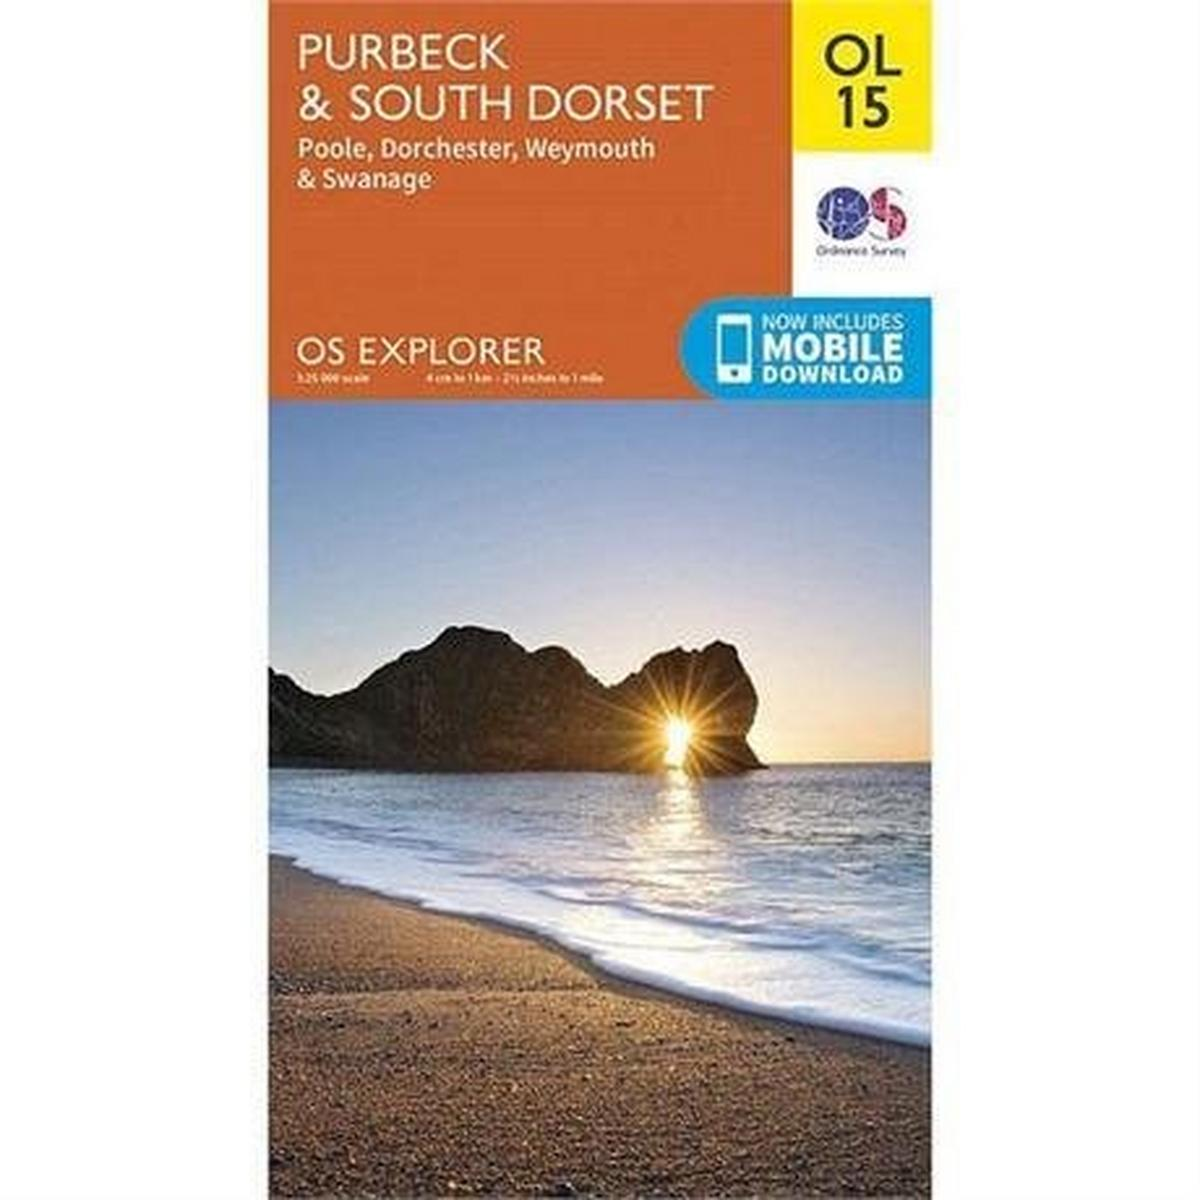 Ordnance Survey OS Explorer Map OL15: Purbeck & South Dorset